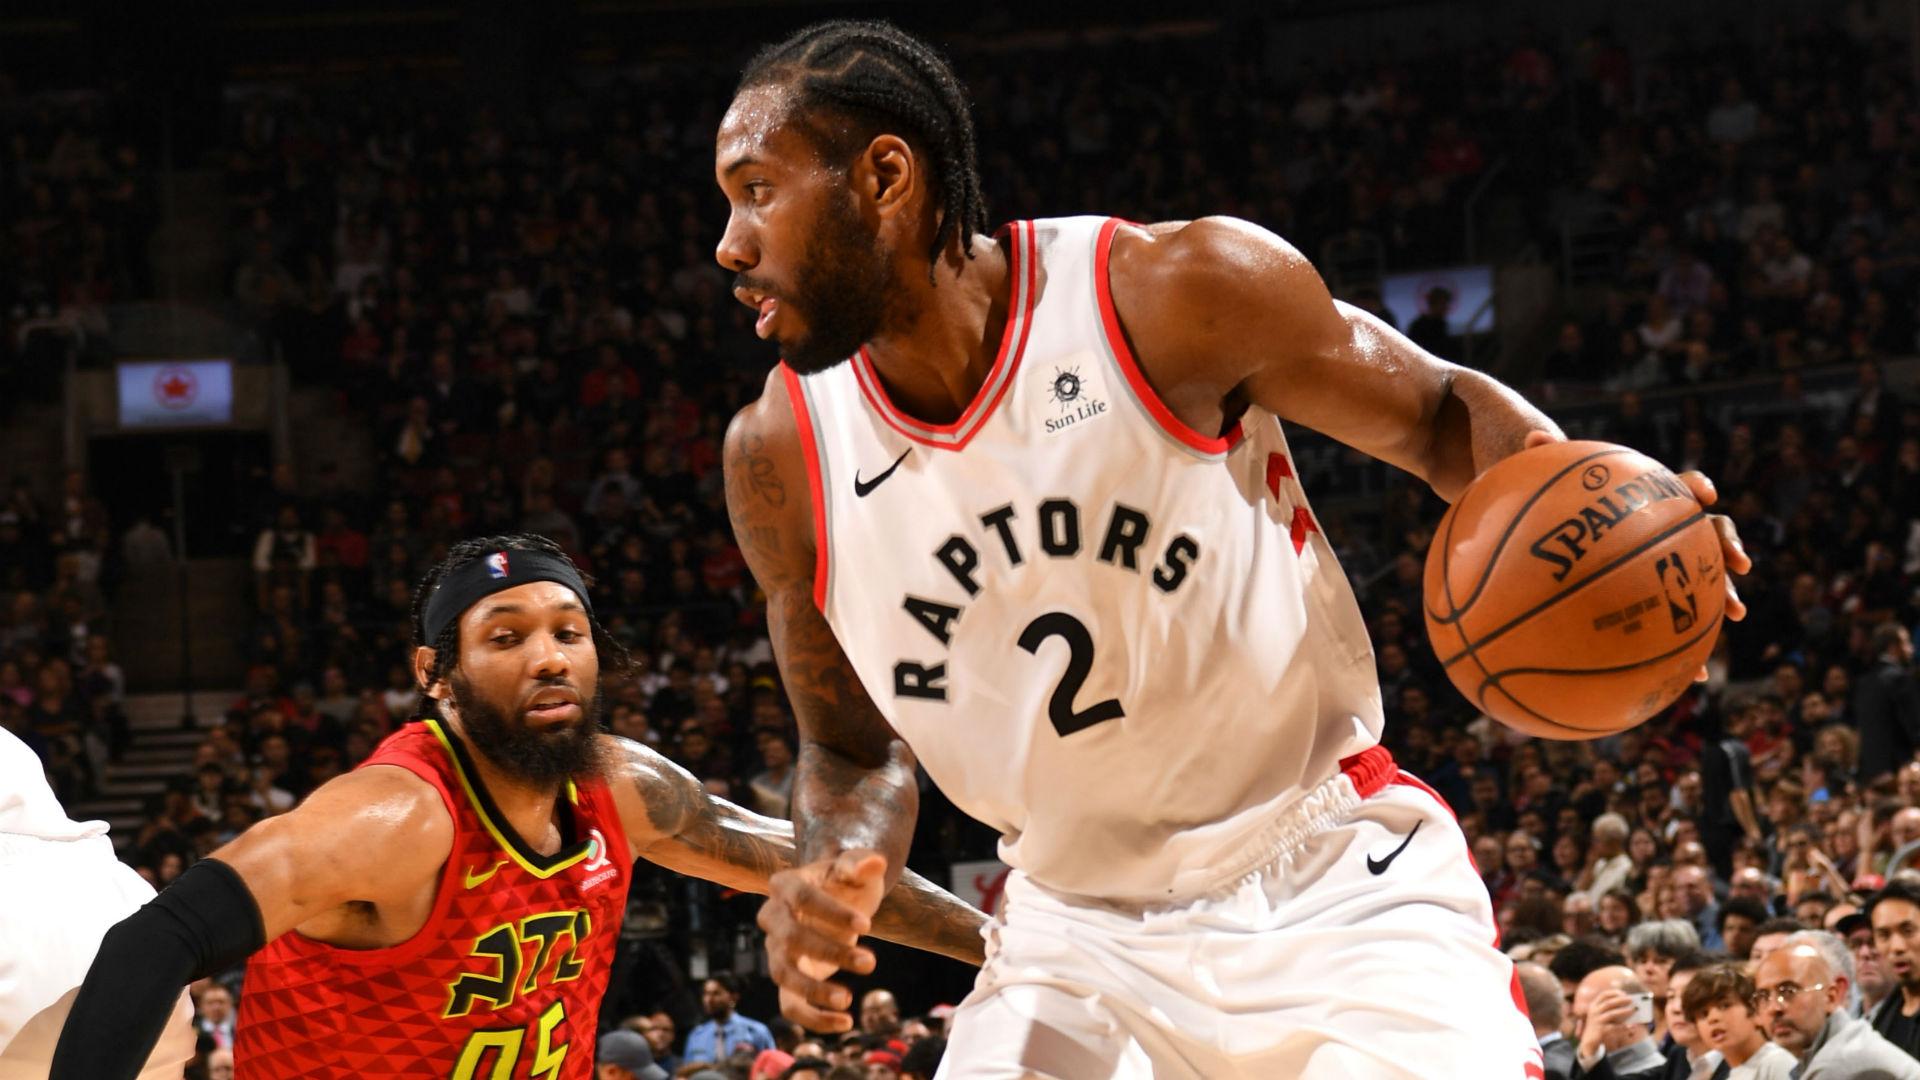 Five takeaways from the Toronto Raptors' close win over the Atlanta Hawks | NBA.com